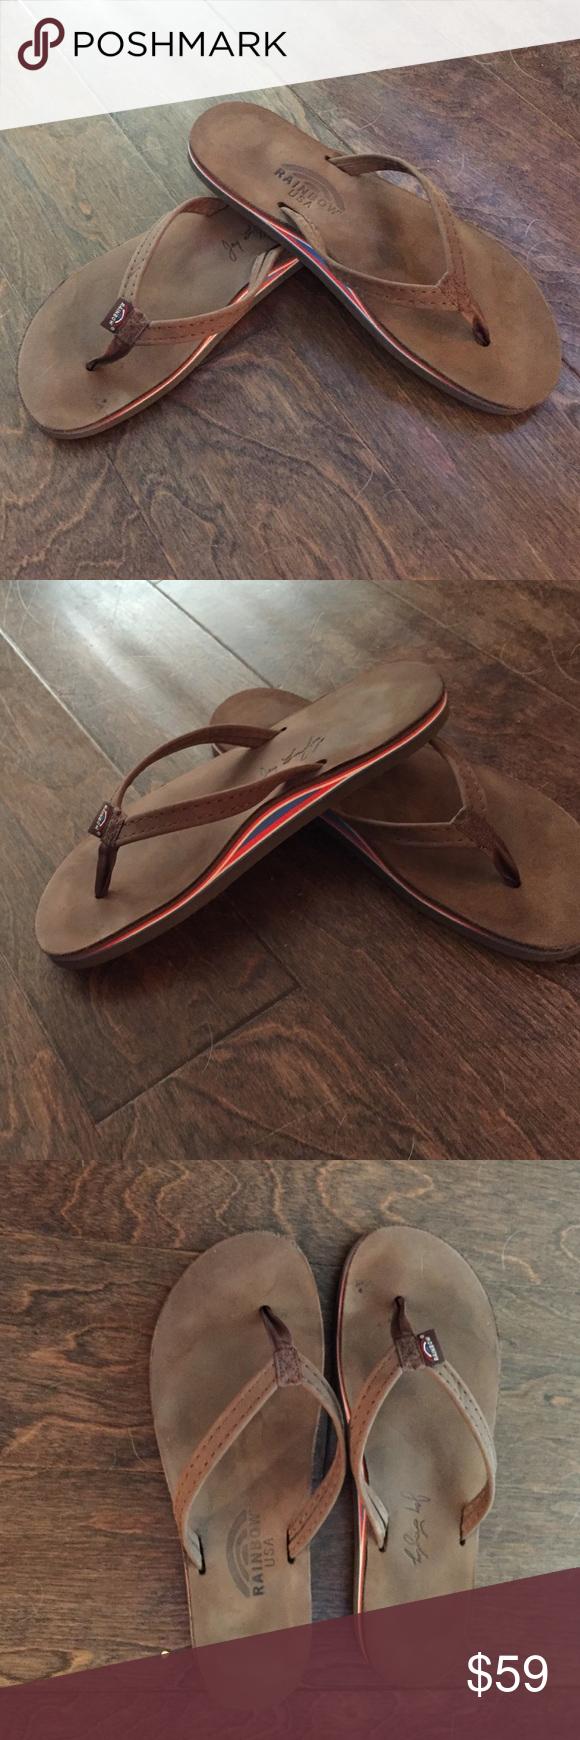 6d977a77c728 Women s rainbow americana sandals Limited edition women s americana sandals.  Size large fits 7.5-8.5